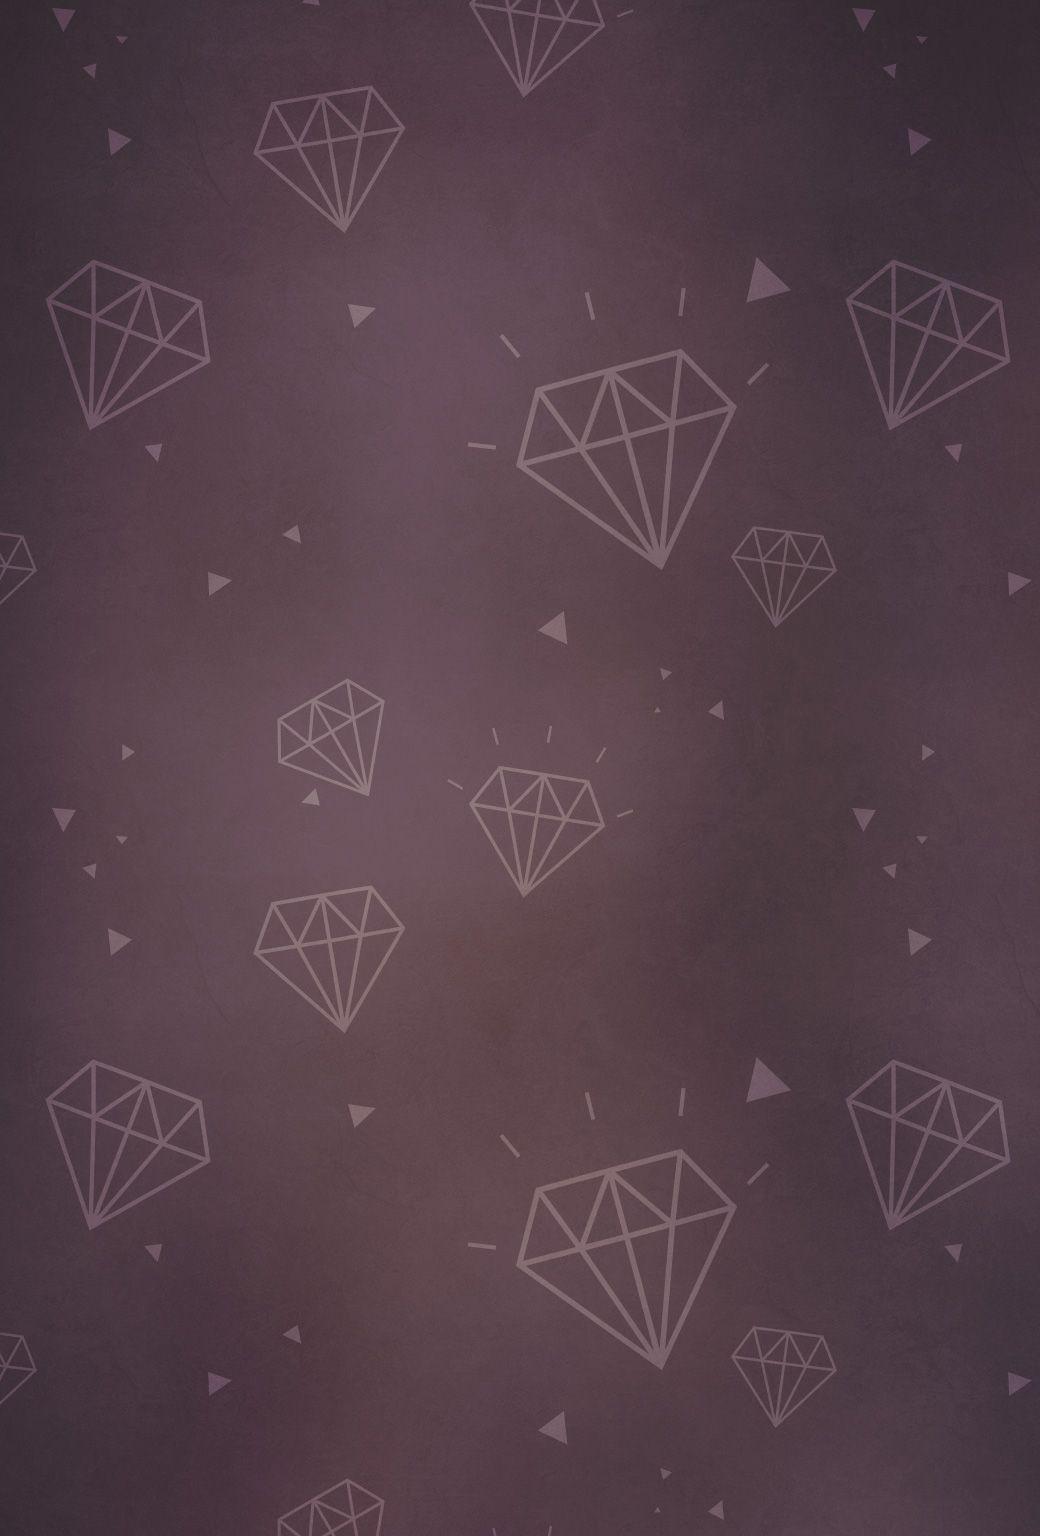 Fond d cran diamants pour smartphones 03 hello for Fond ecran smartphone